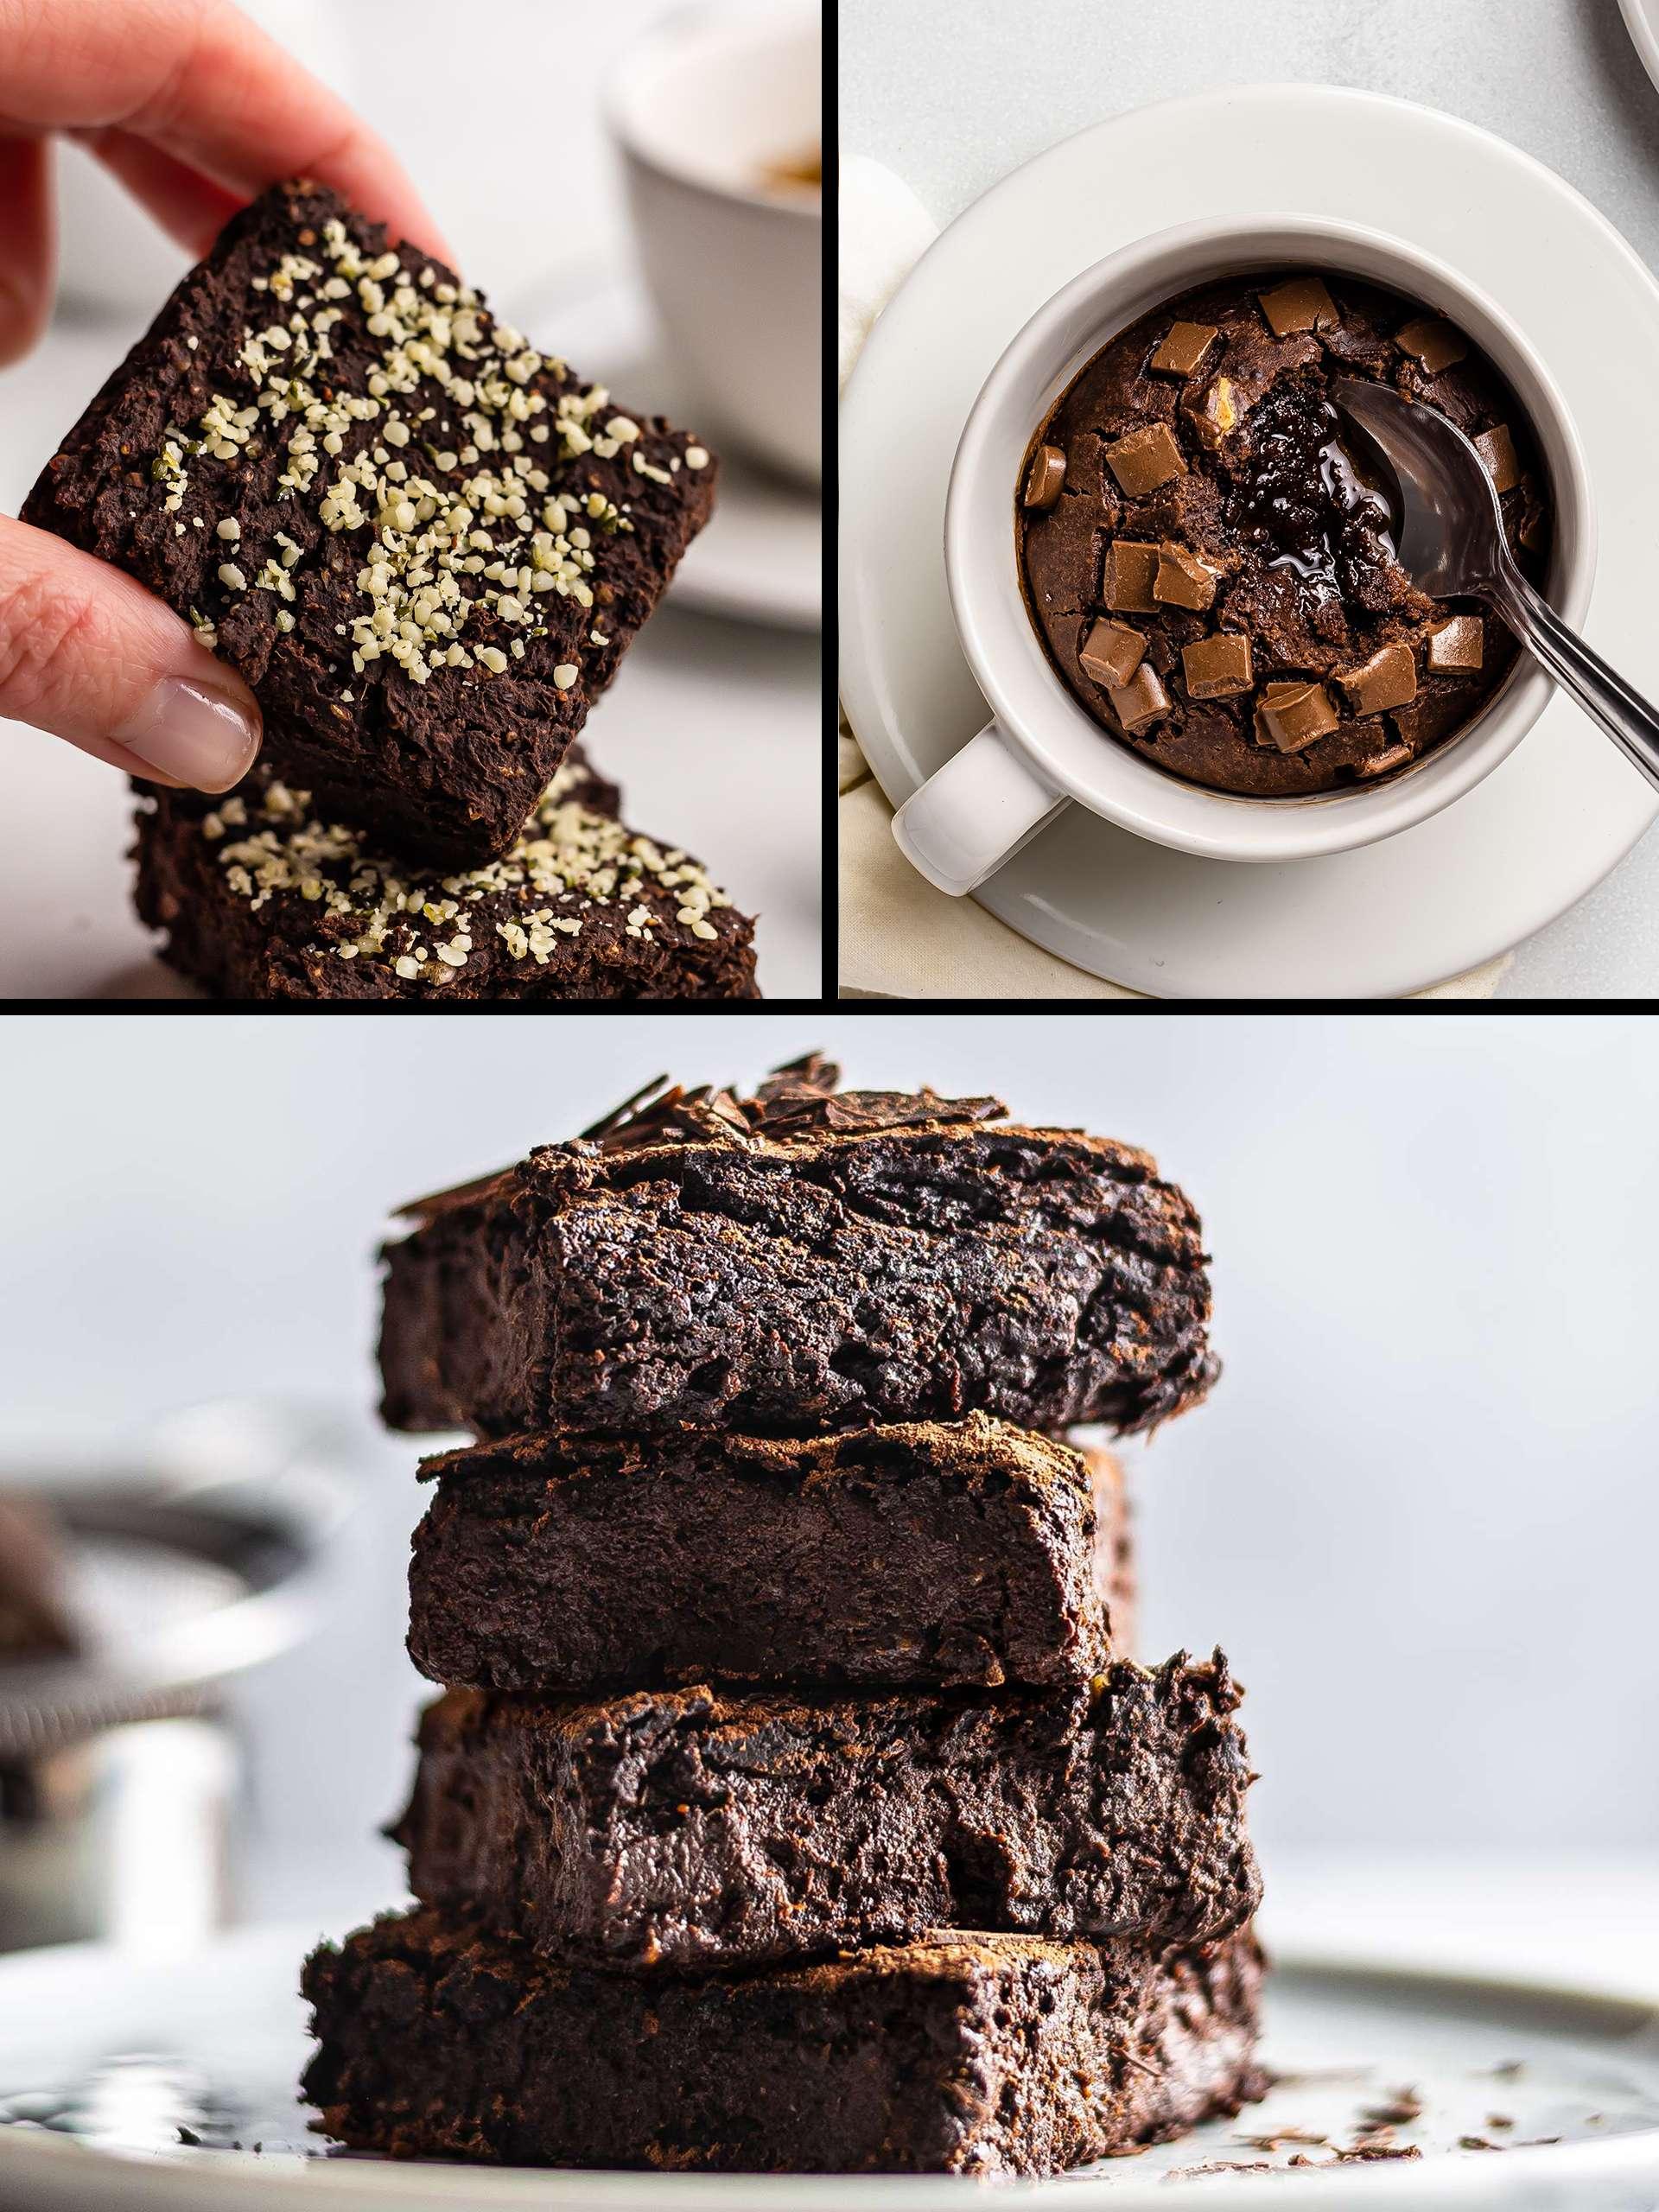 7 Alternative Vegan Brownies Recipes